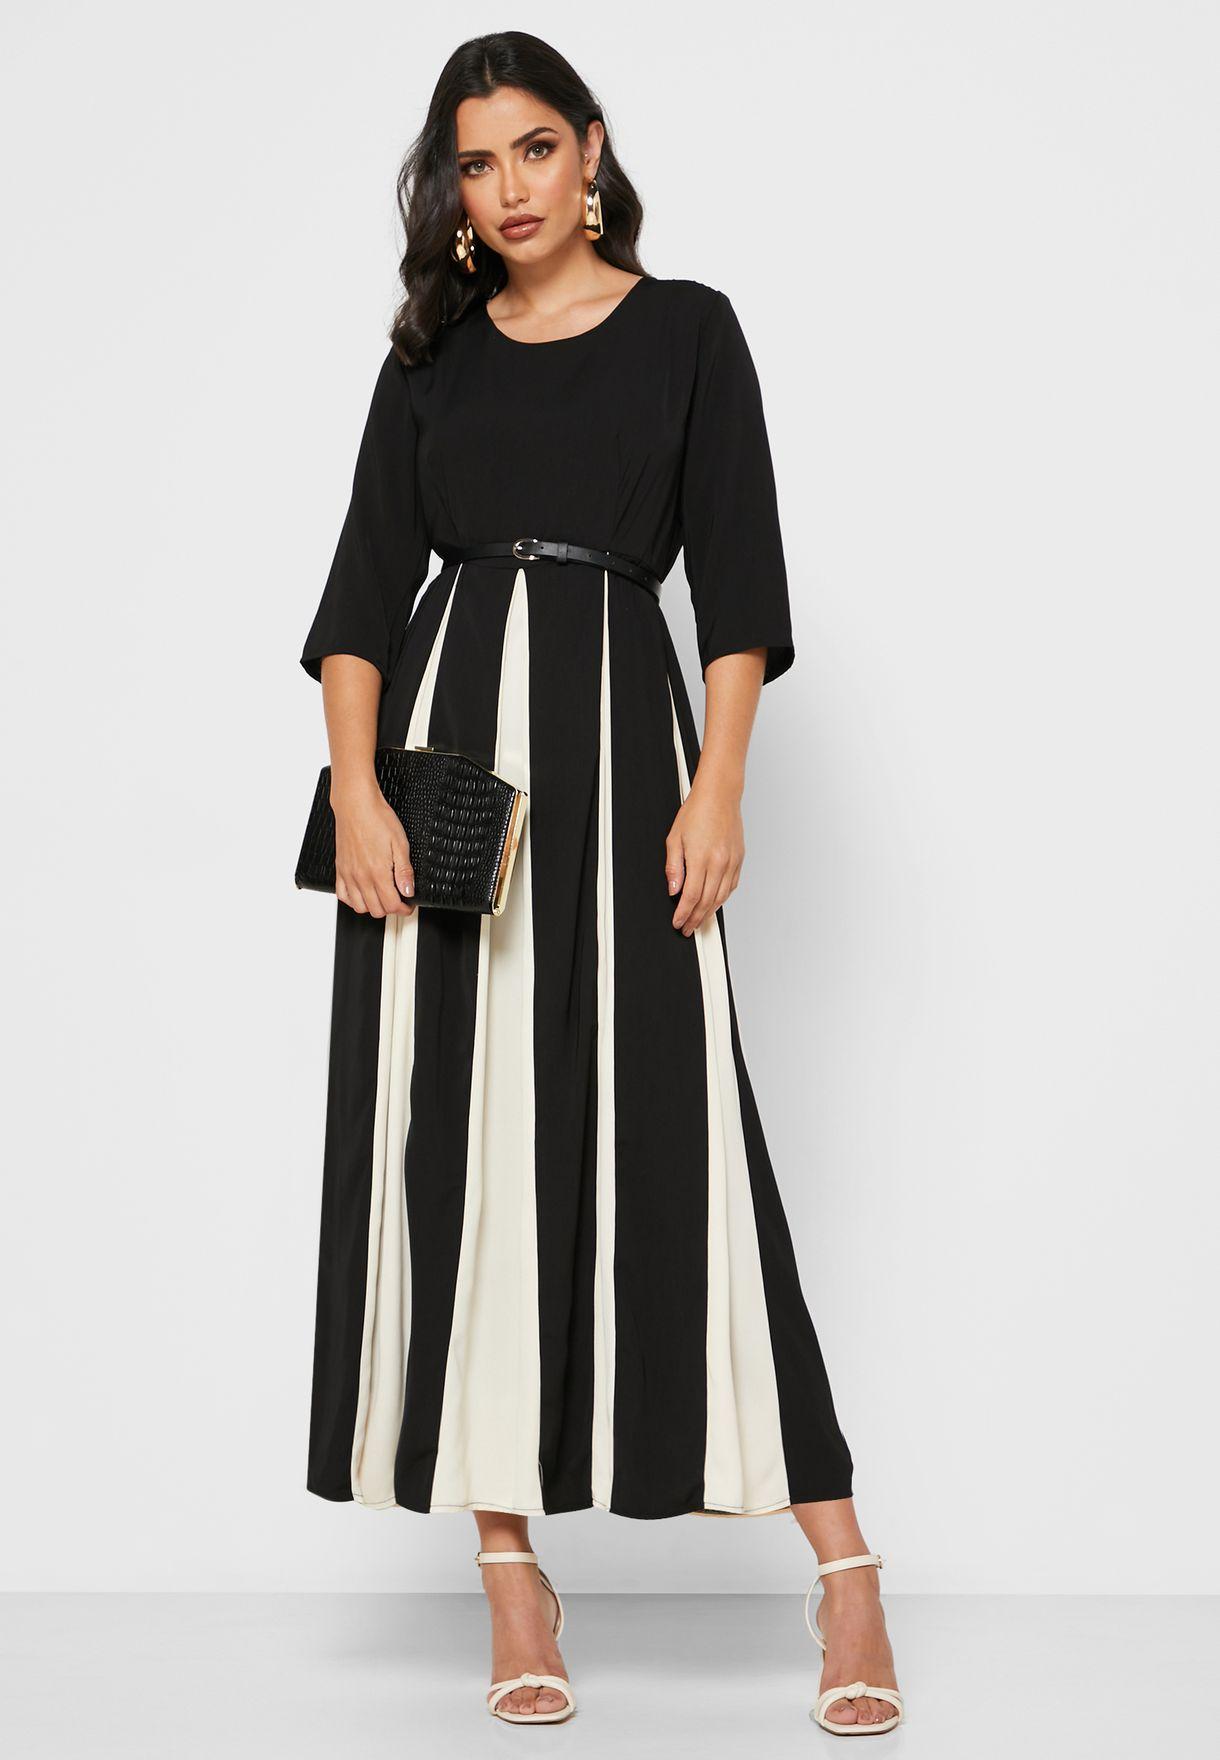 Colourblock Belted Midi Dress